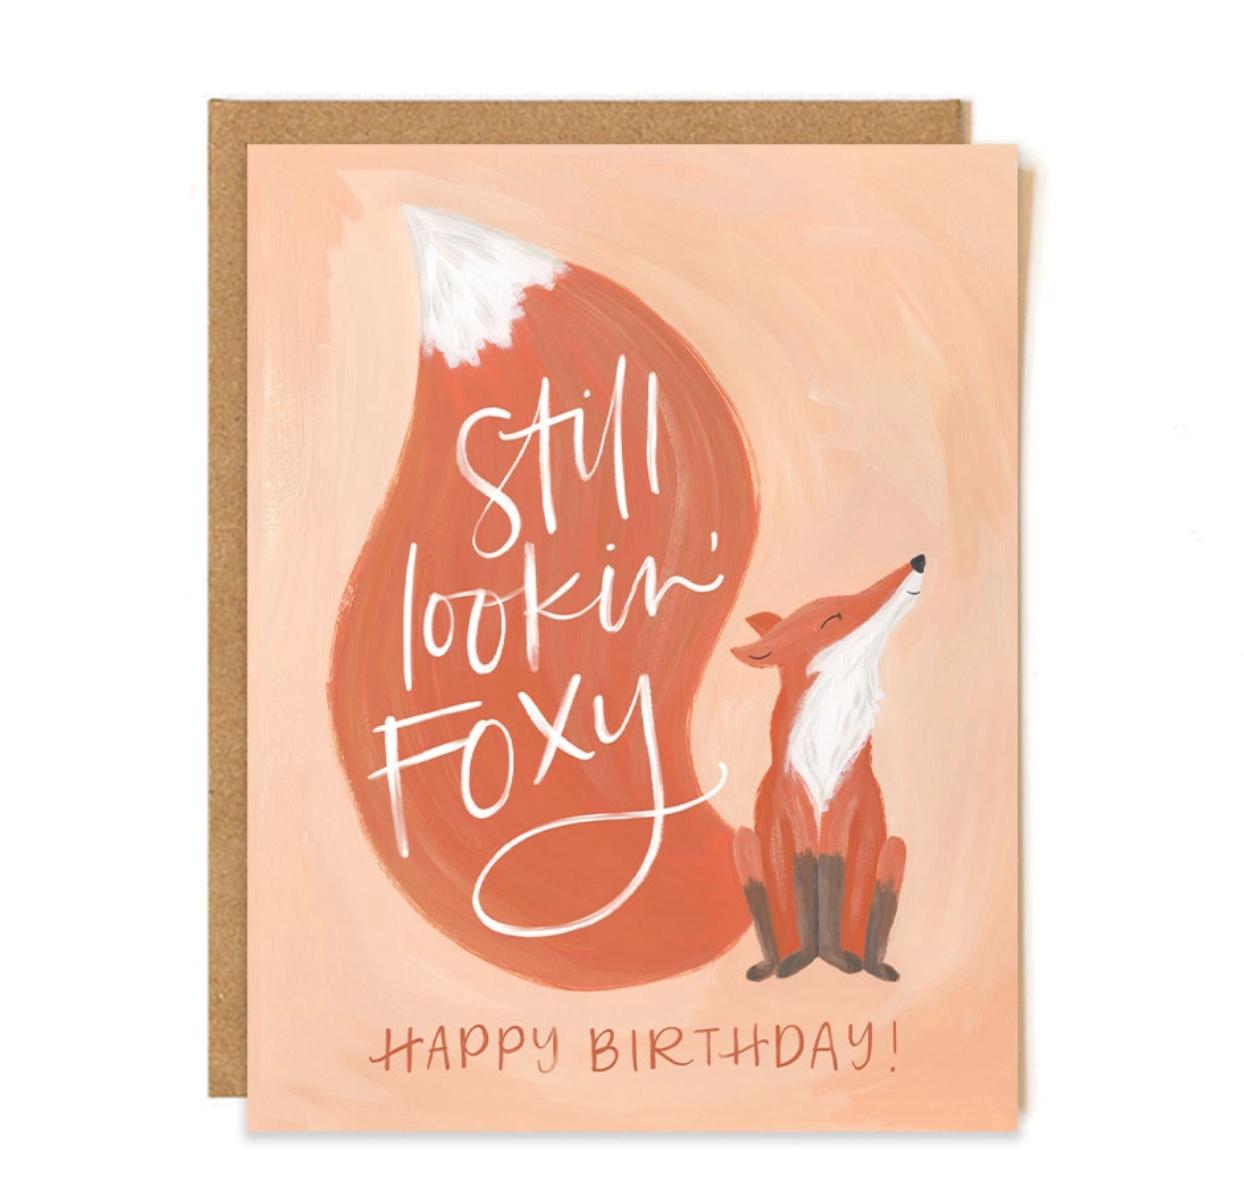 1canoe2 Foxy Birthday Greeting Card